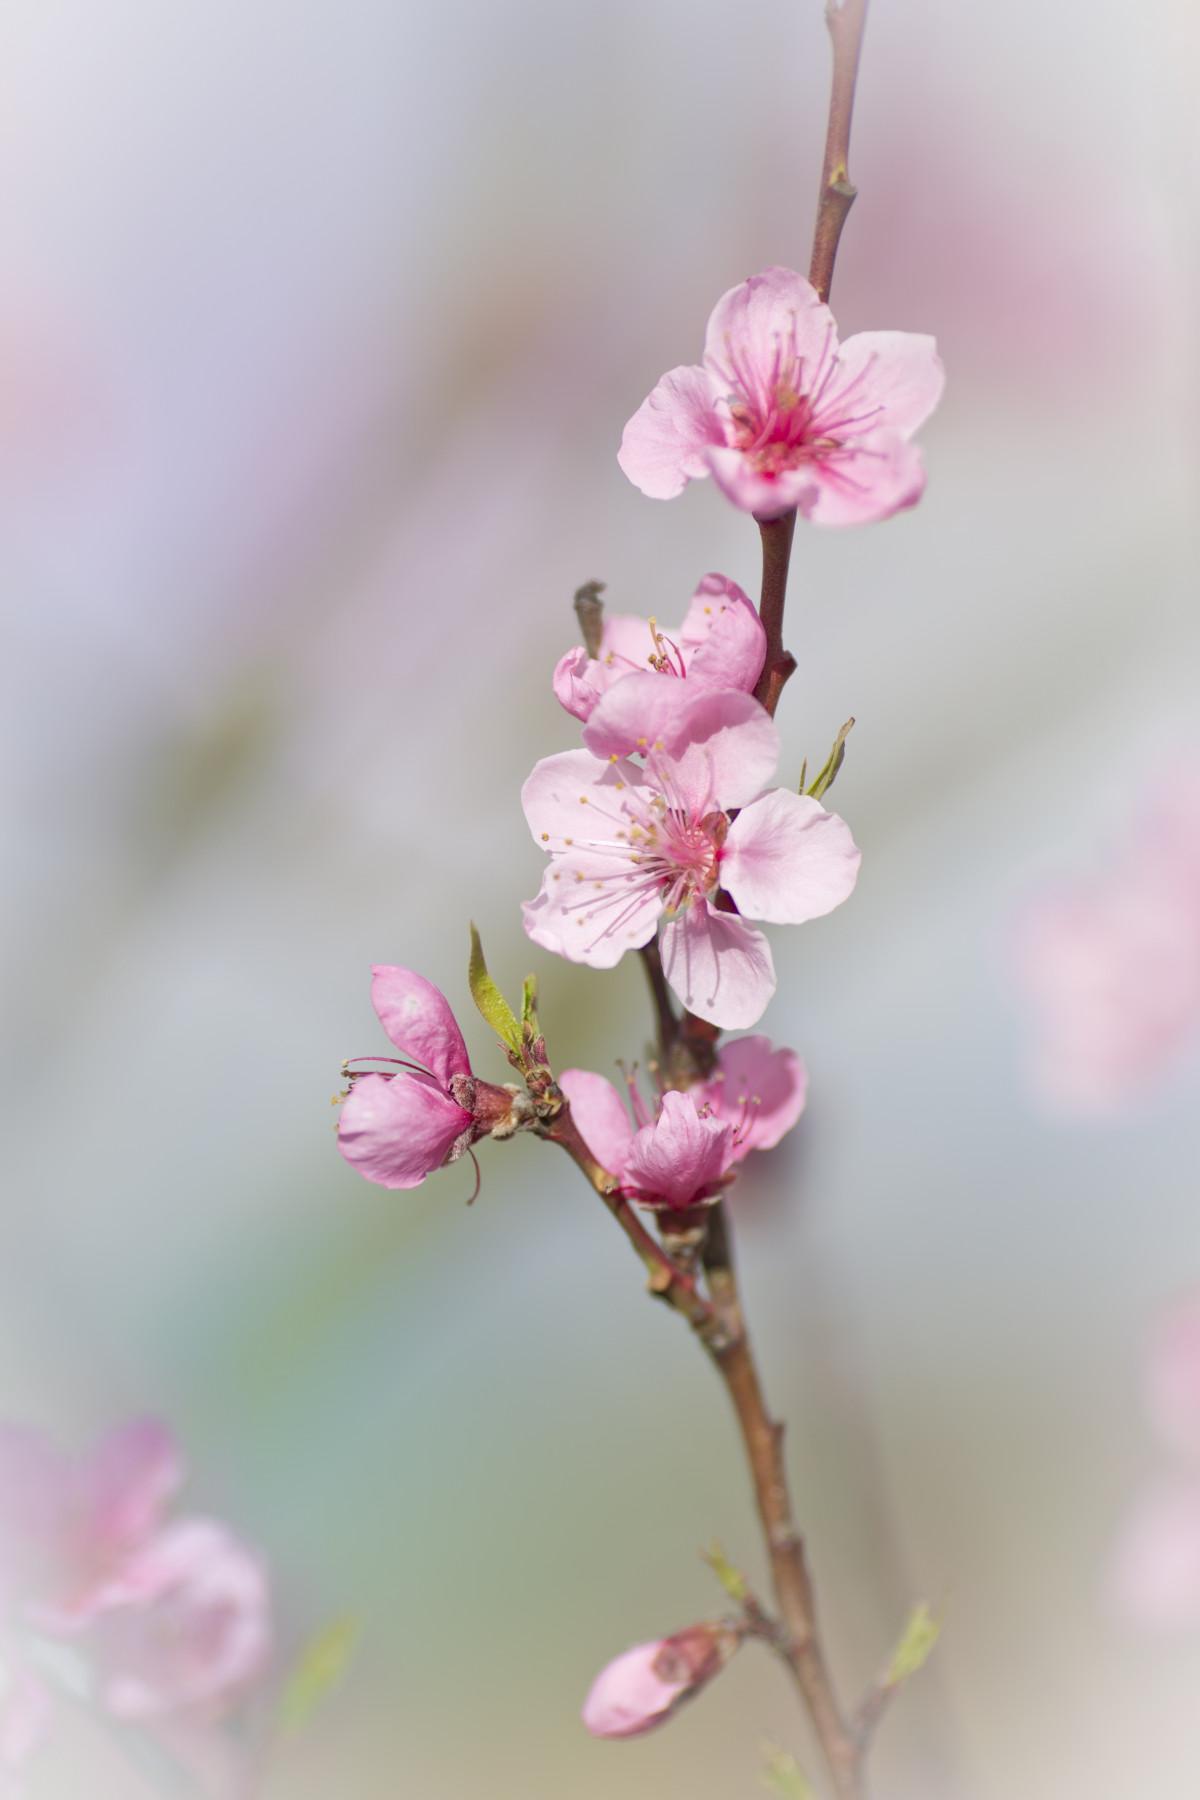 Free Images : nature, branch, fruit, petal, food, produce ...